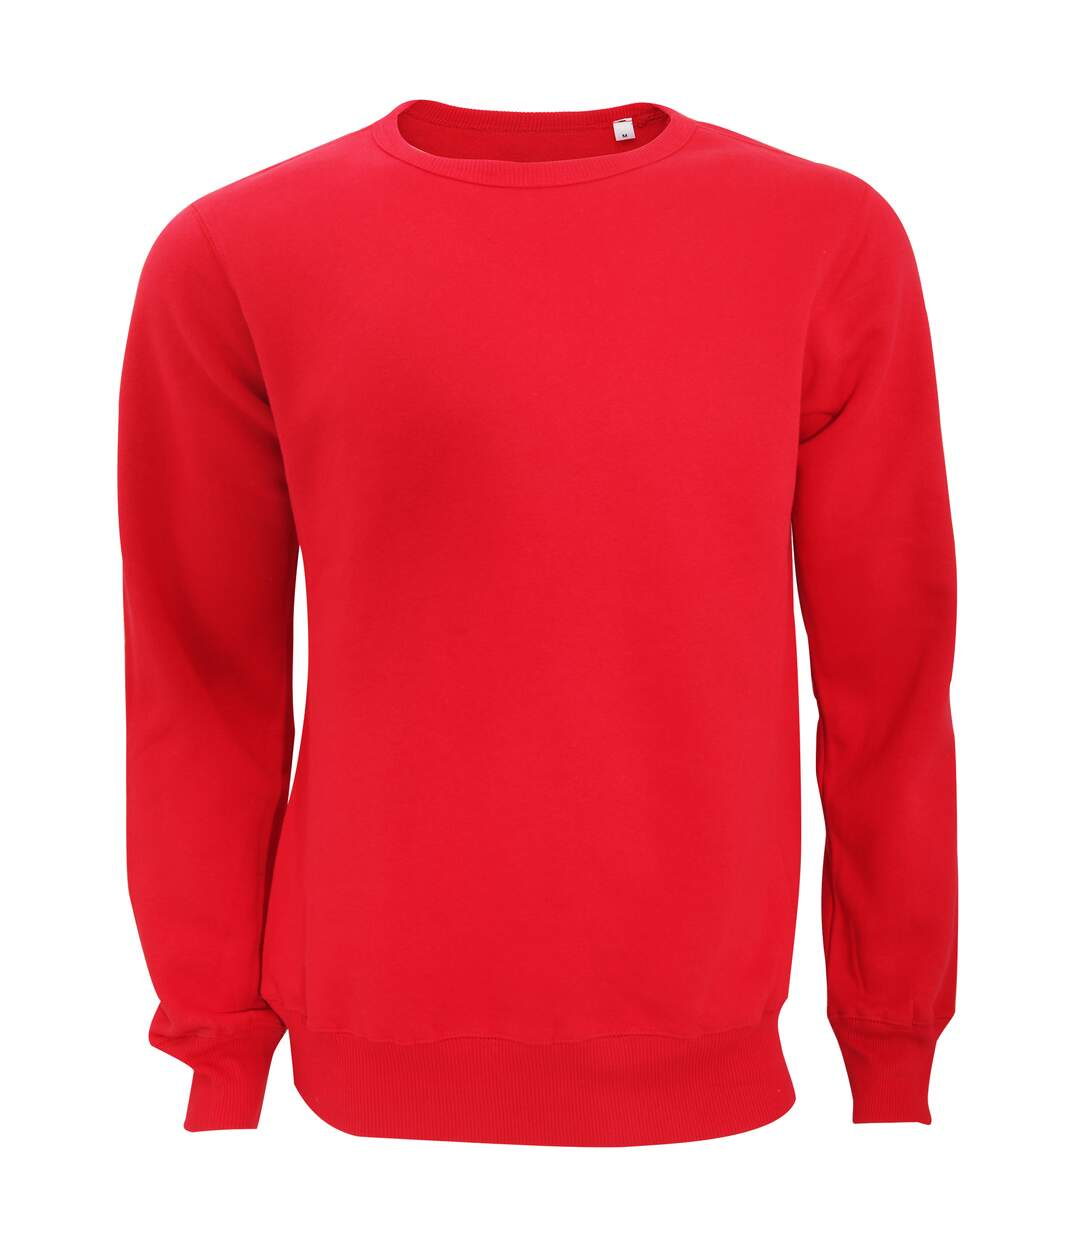 Active By Stedman Mens Sweatshirt (Crimson Red) - UTBC3104